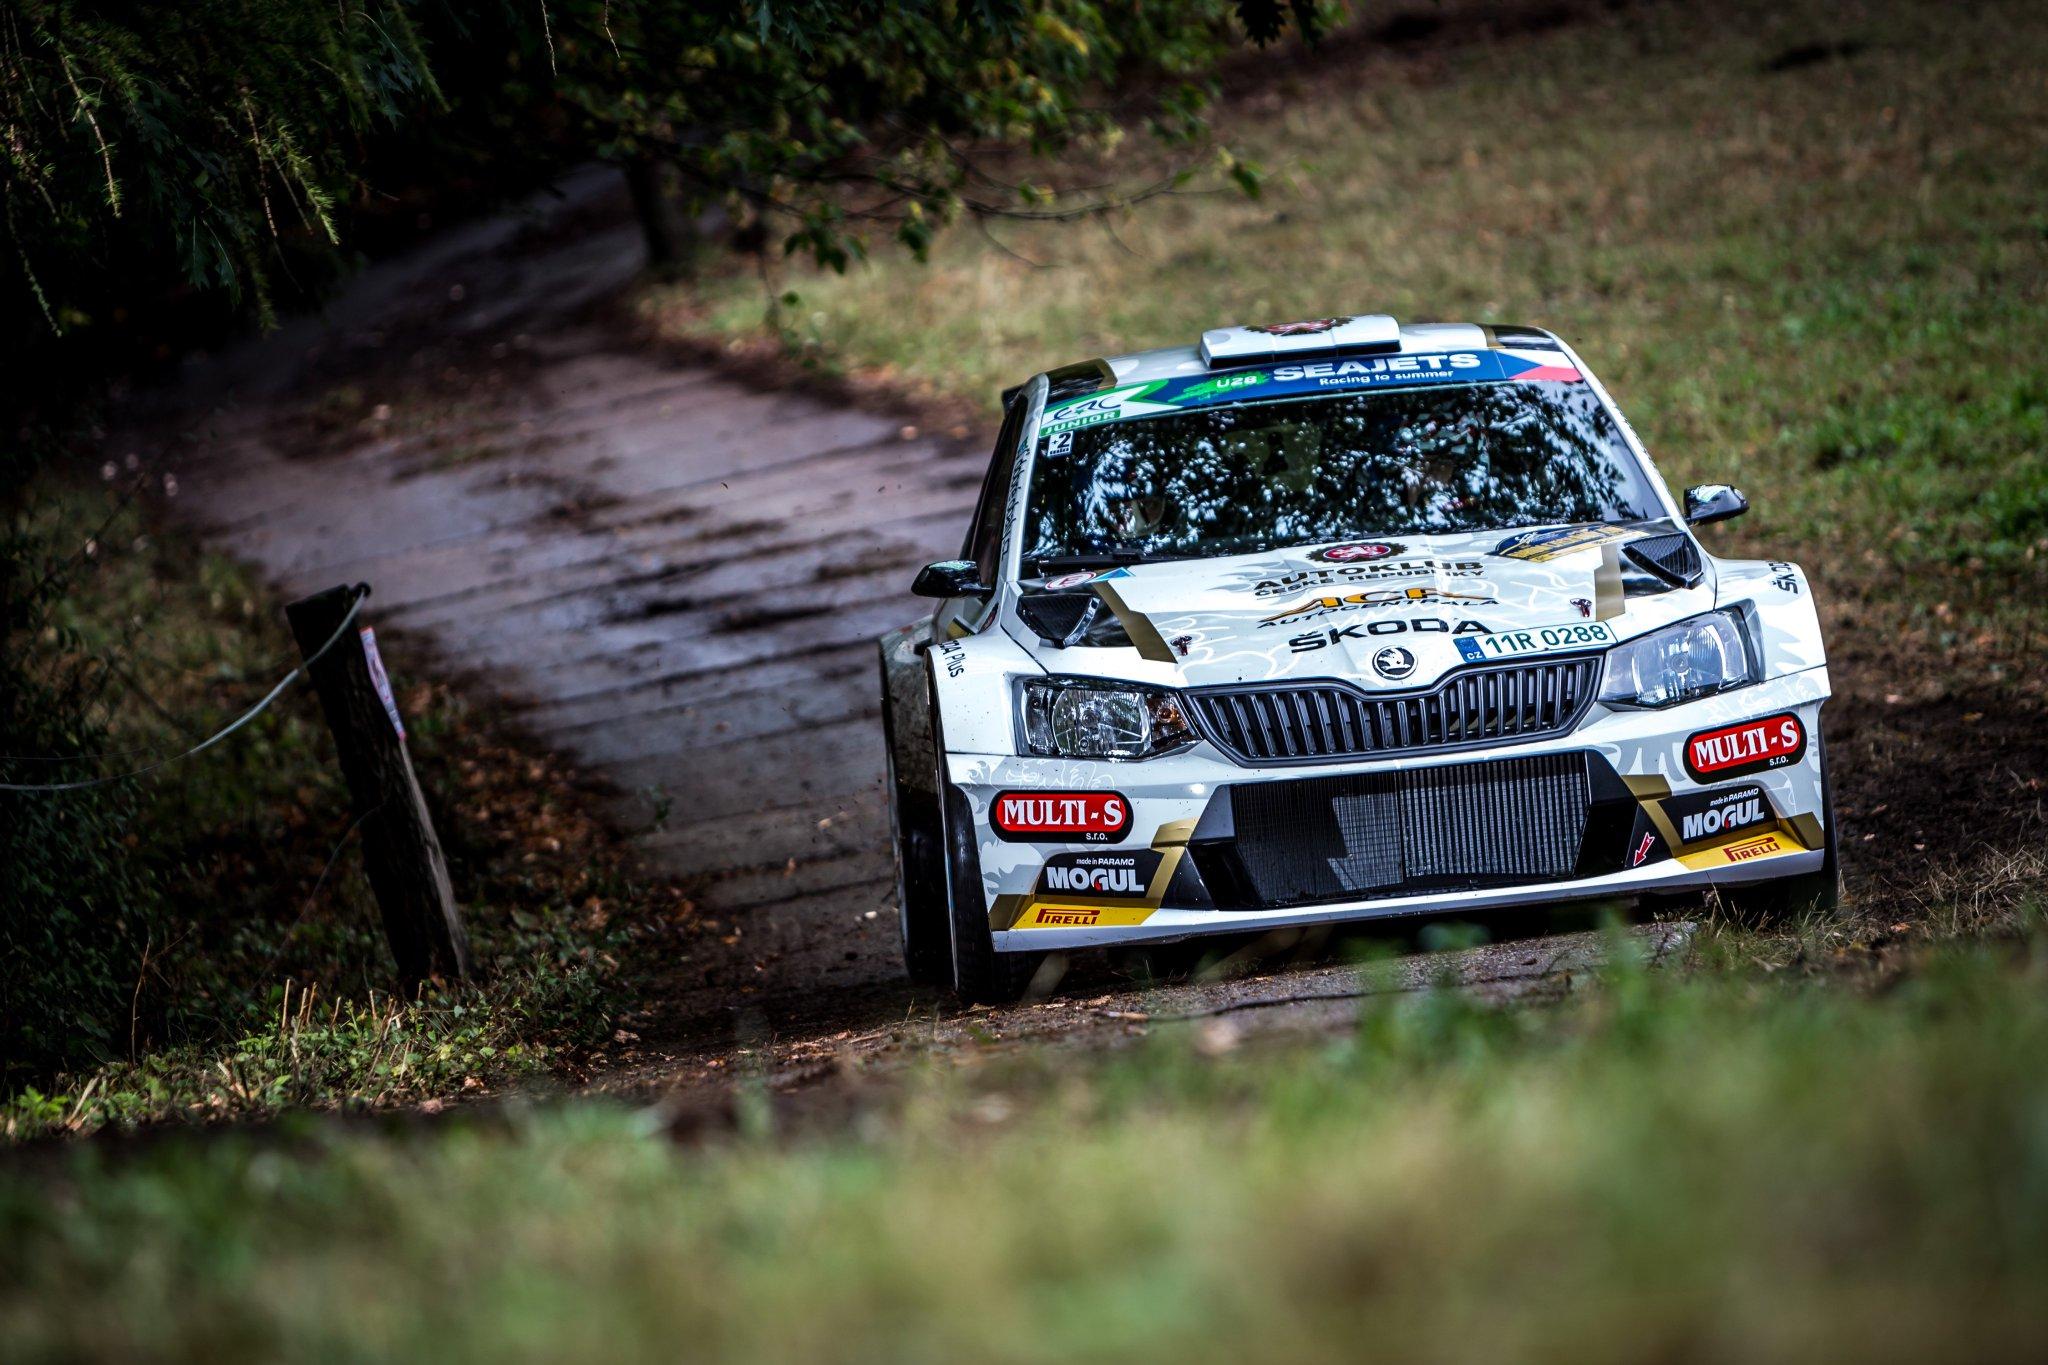 Rally Barum 2018 ERC - Página 2 DldSJmrXsAM9YU1